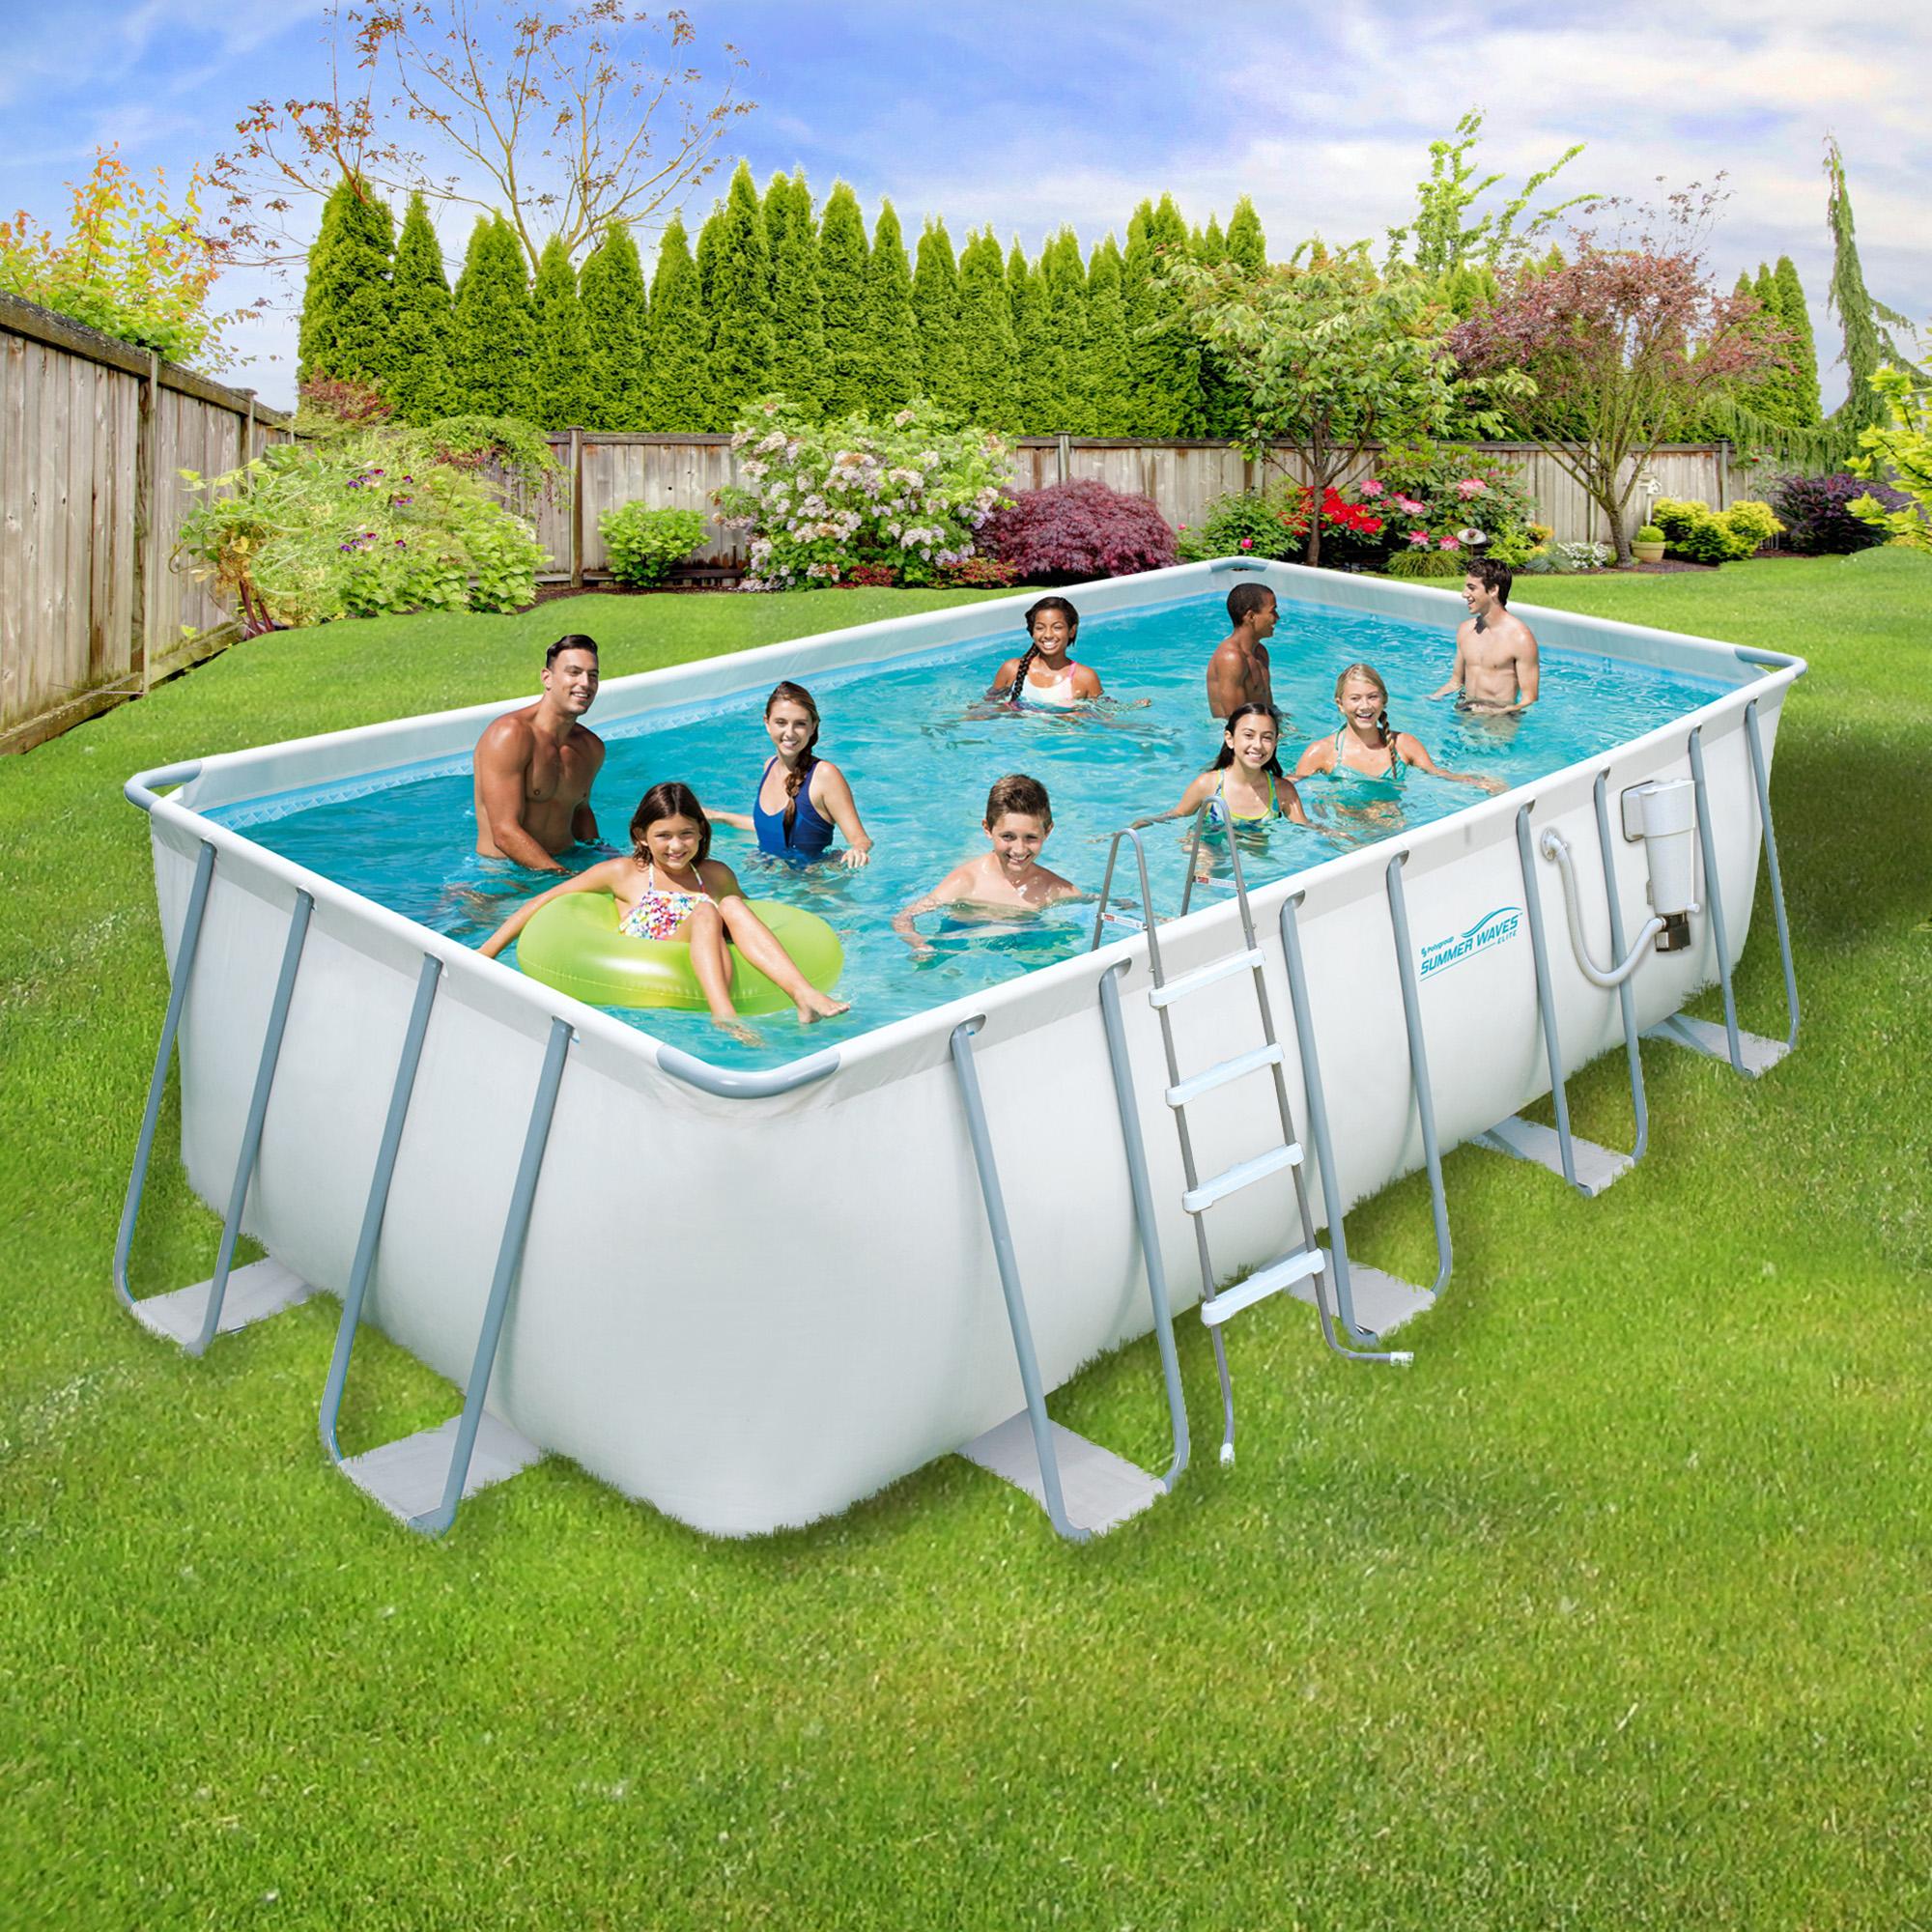 Summer Waves Elite 9-ft x 18-ft Rectangular 52-in Deep Metal Frame Swimming Pool Package